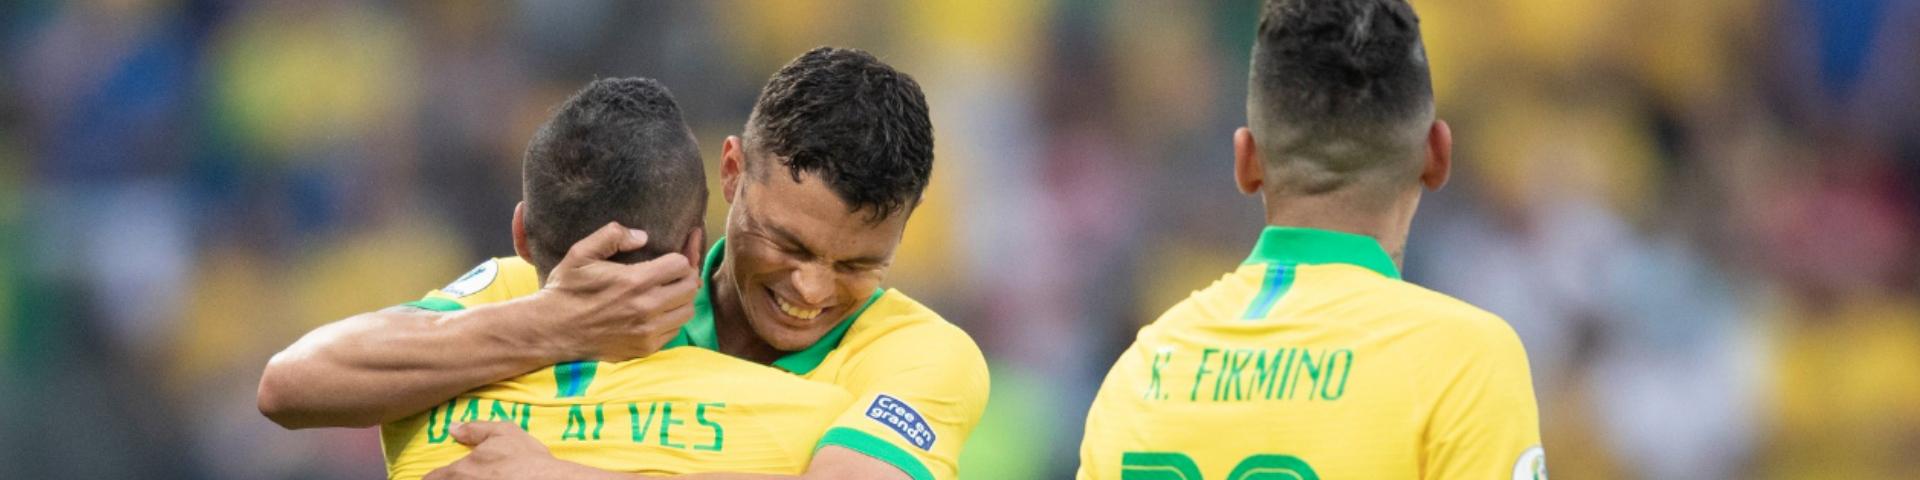 Бразилия — Парагвай